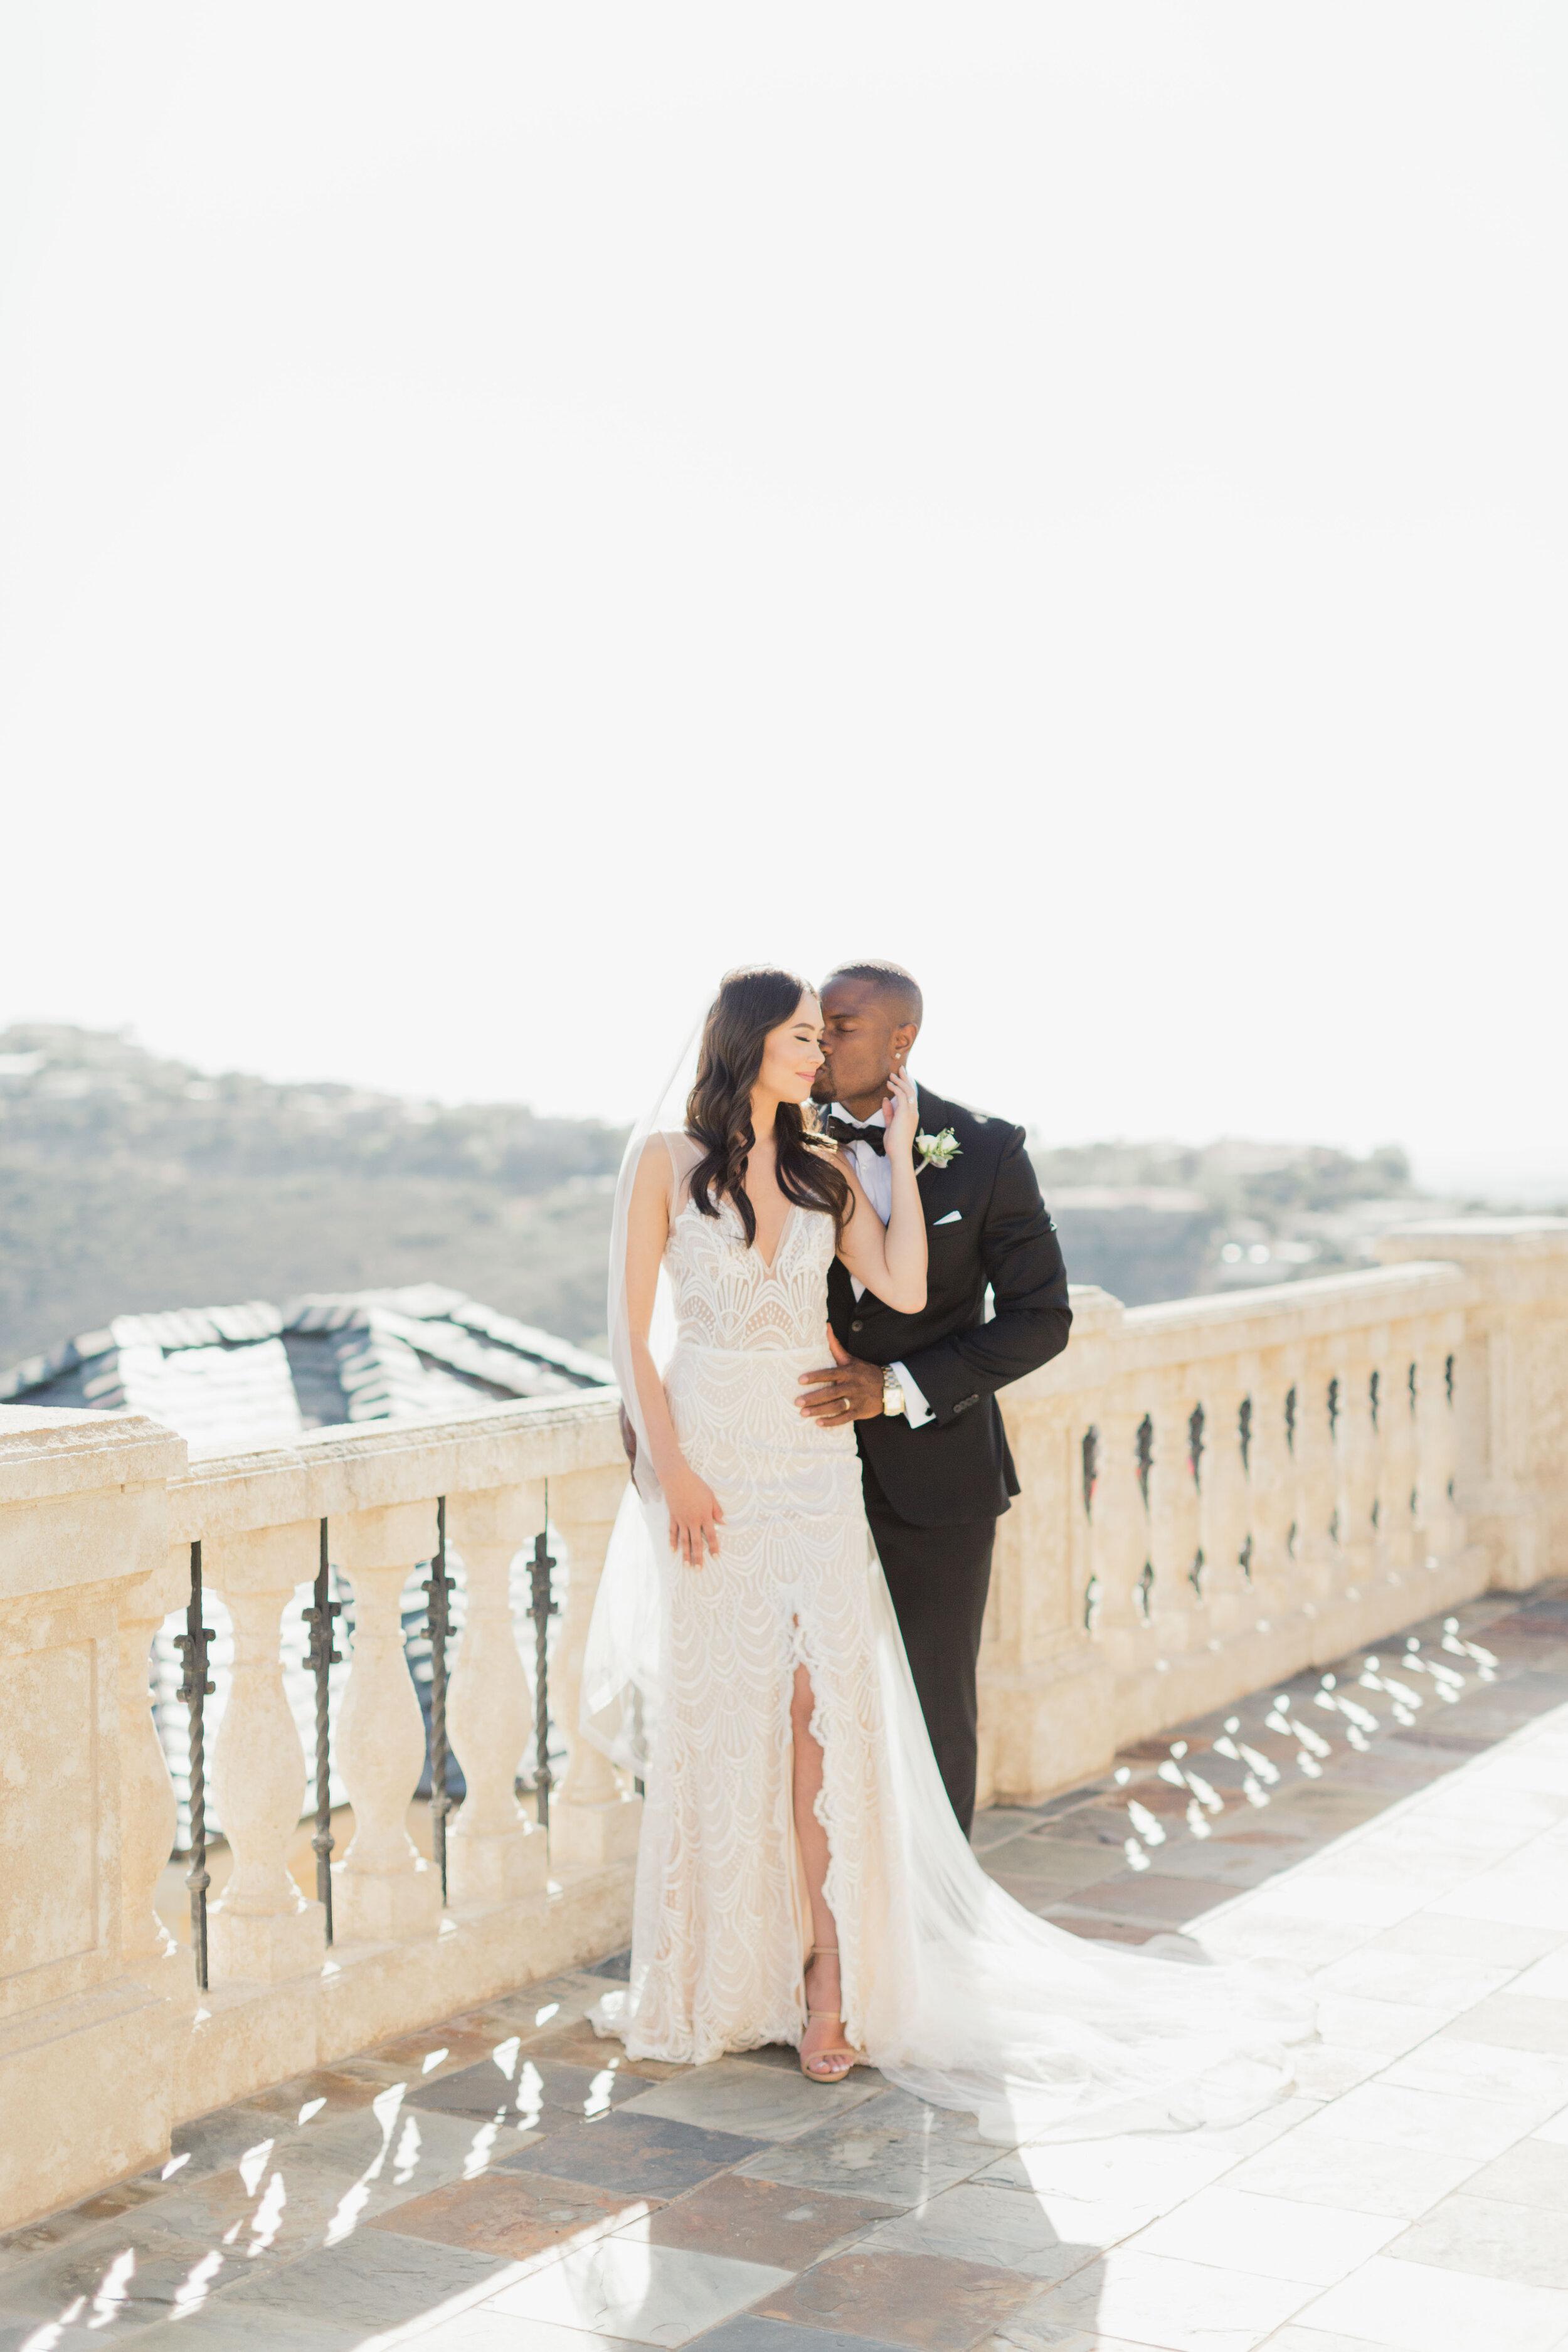 548_Ekpre_Olomu_Hidden_Castle_Estate_Wedding_Rancho_Santa_Fe_California_Devon_Donnahoo_Photography.jpg